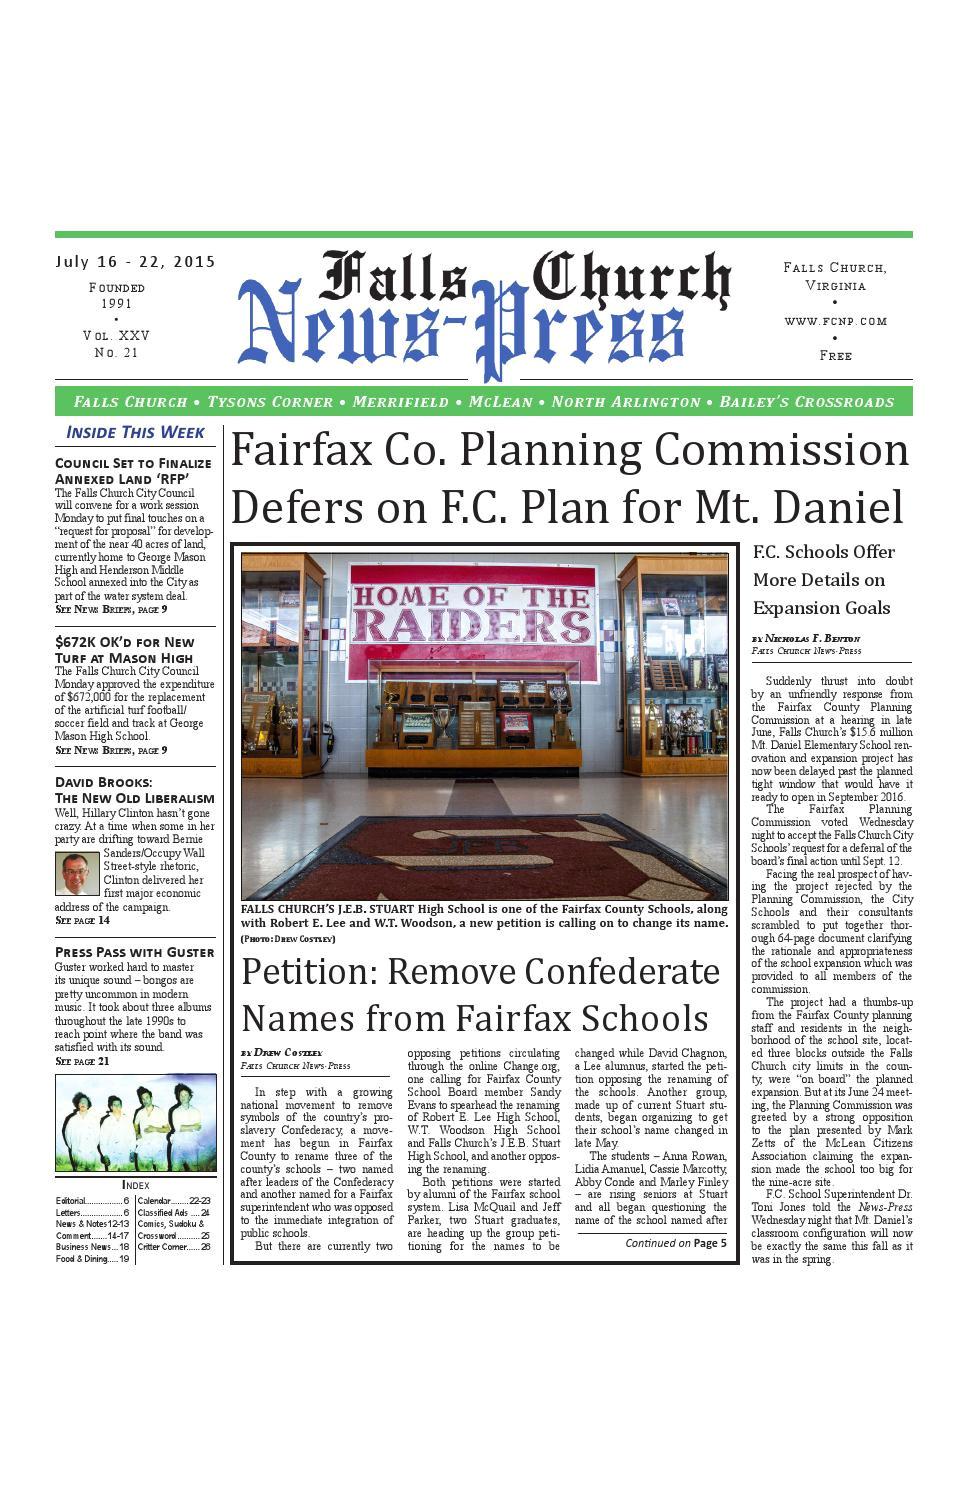 Captain Party Store Roanoke Va 7 16 2015 by Falls Church News Press issuu